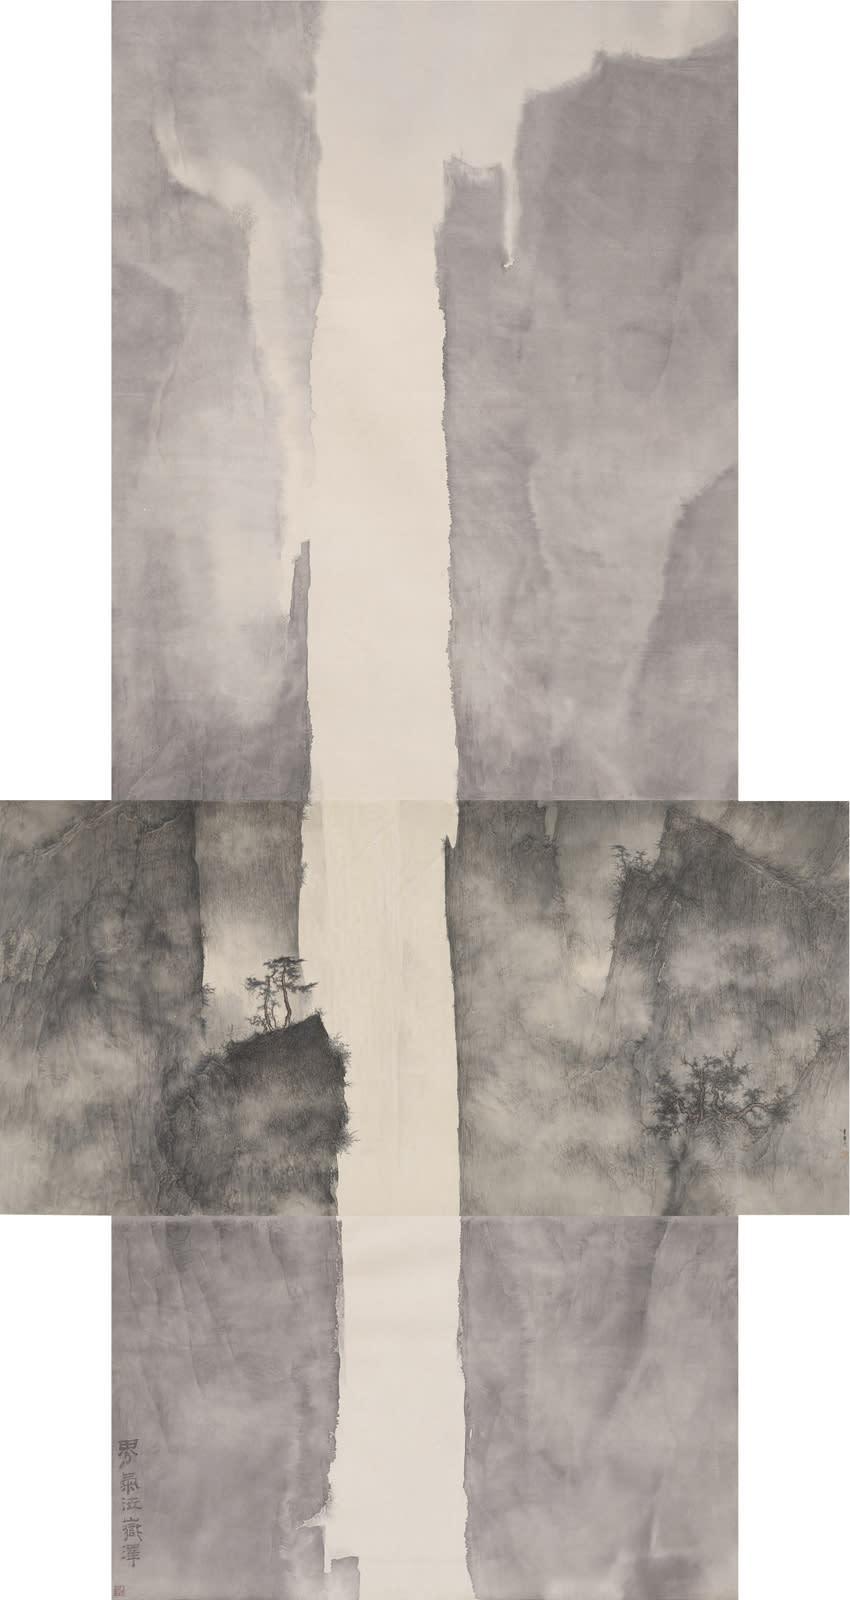 Li Huayi 李華弌, Mountain and Details of the Mountain《此山中》, 2010